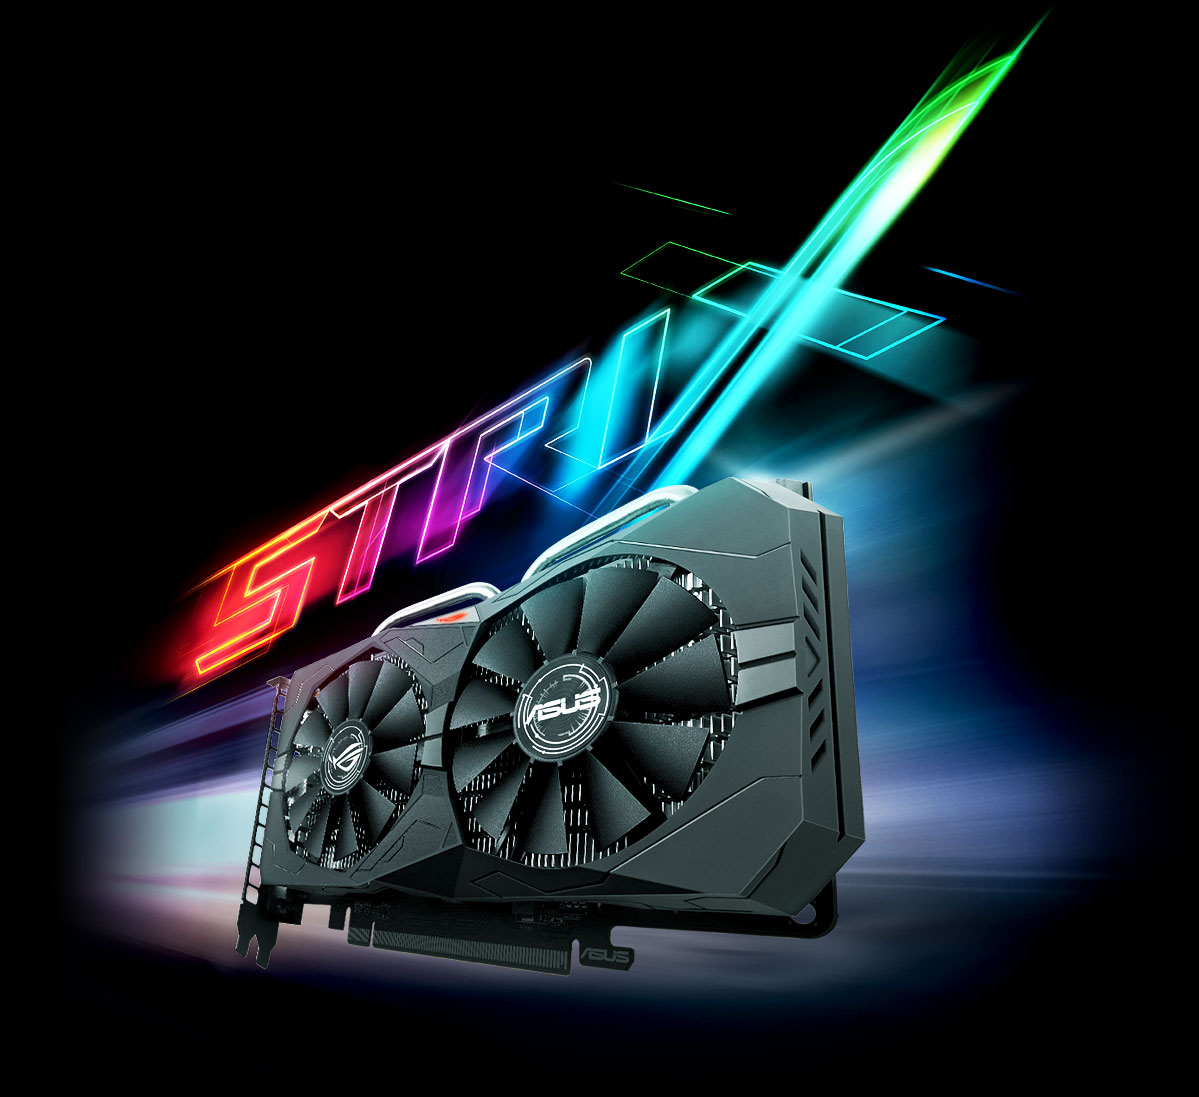 ROG-STRIX-RX560-4G-GAMING | Graphics Cards | ASUS USA